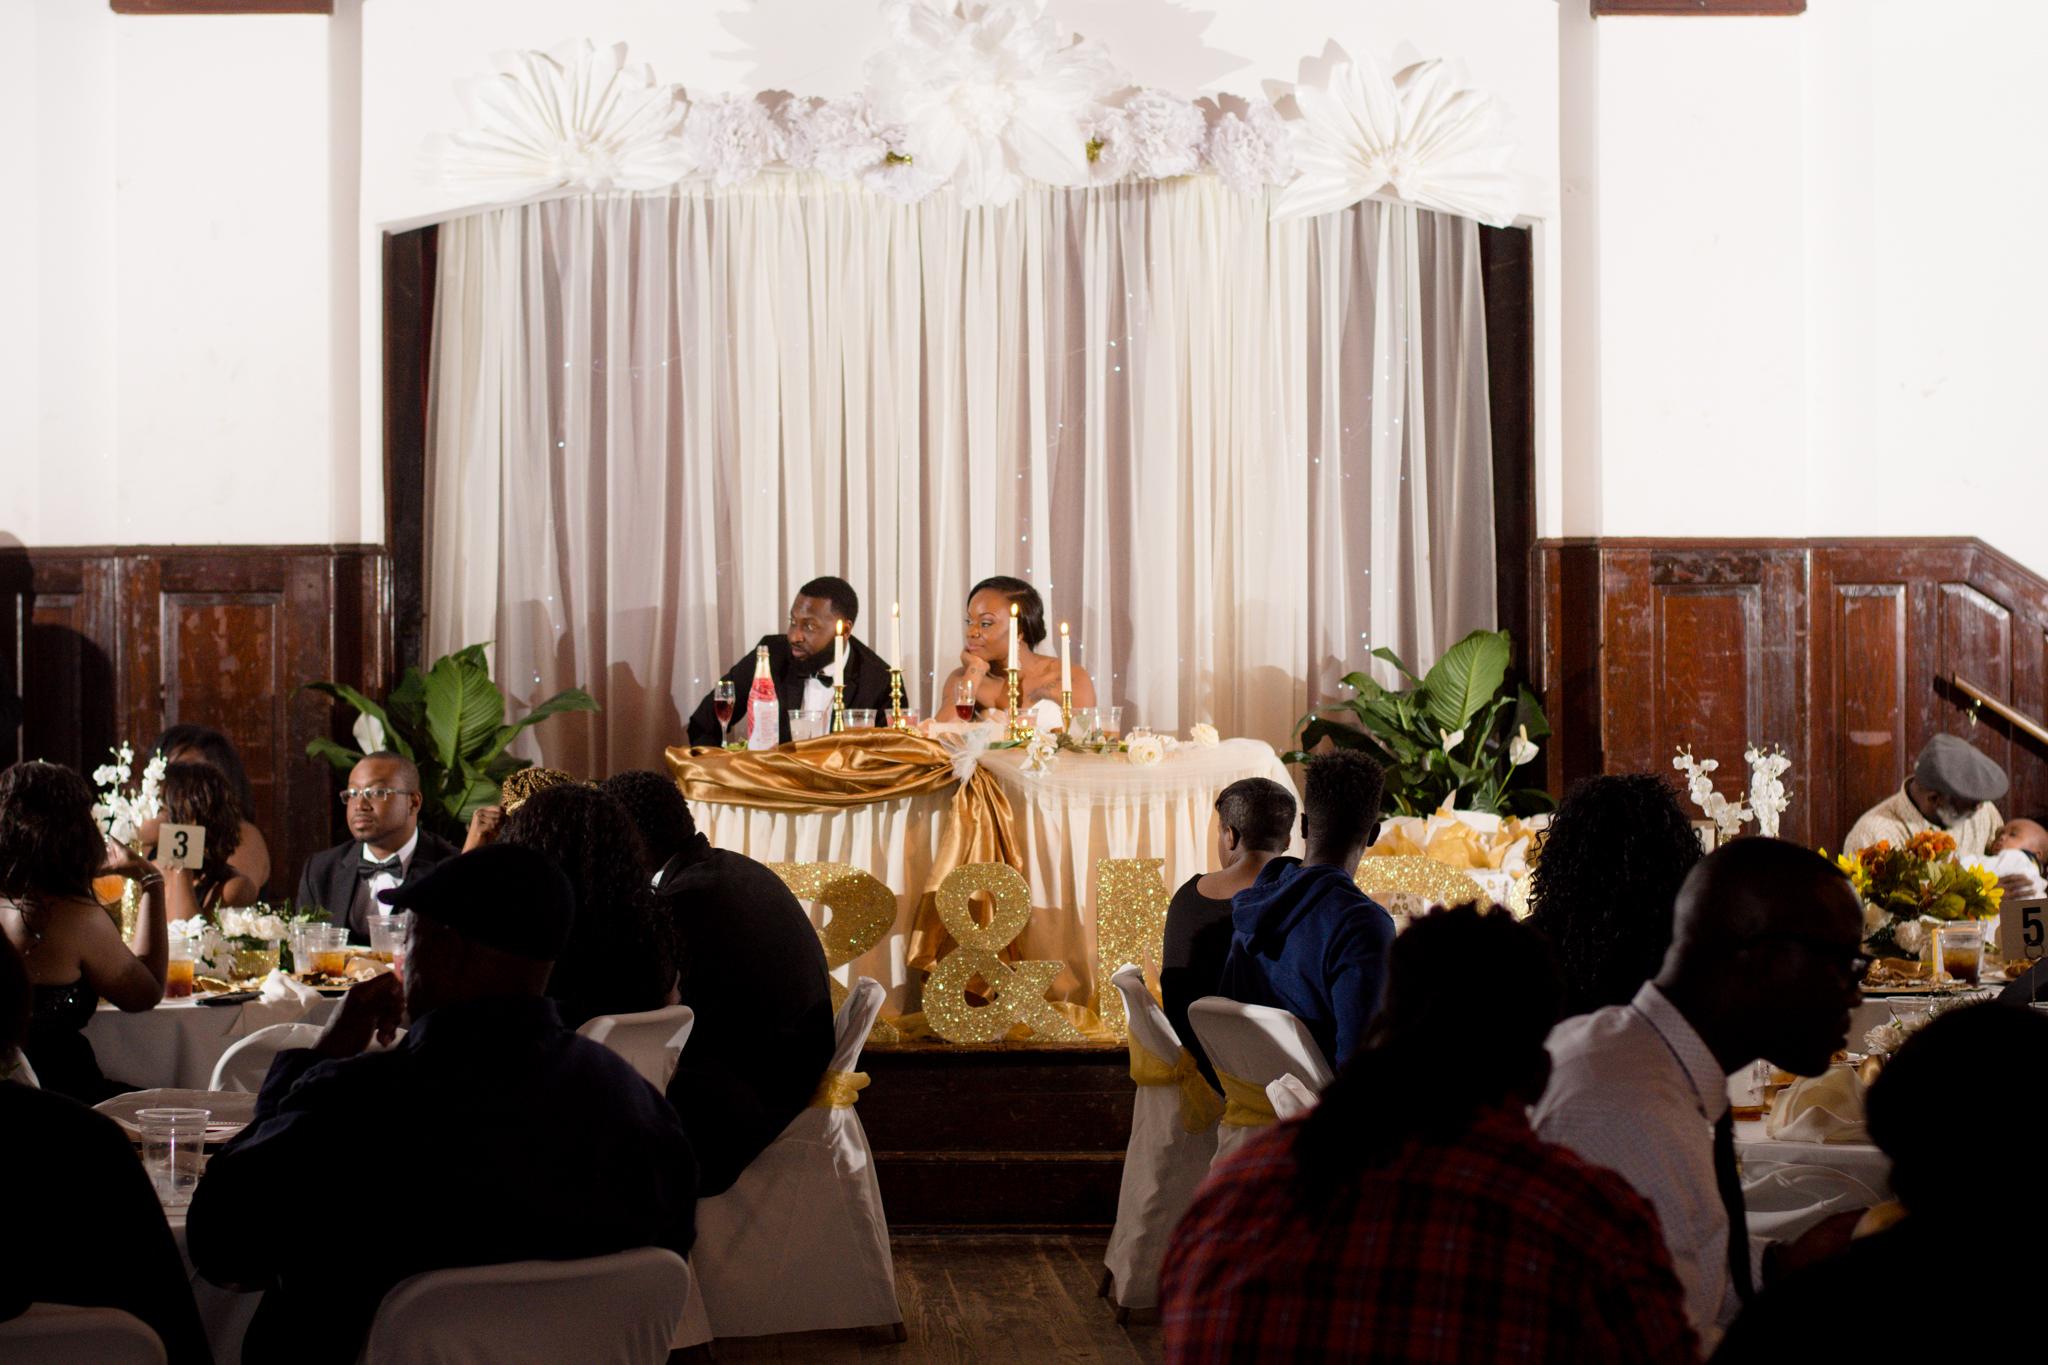 chaplin wedding (161 of 181).JPG